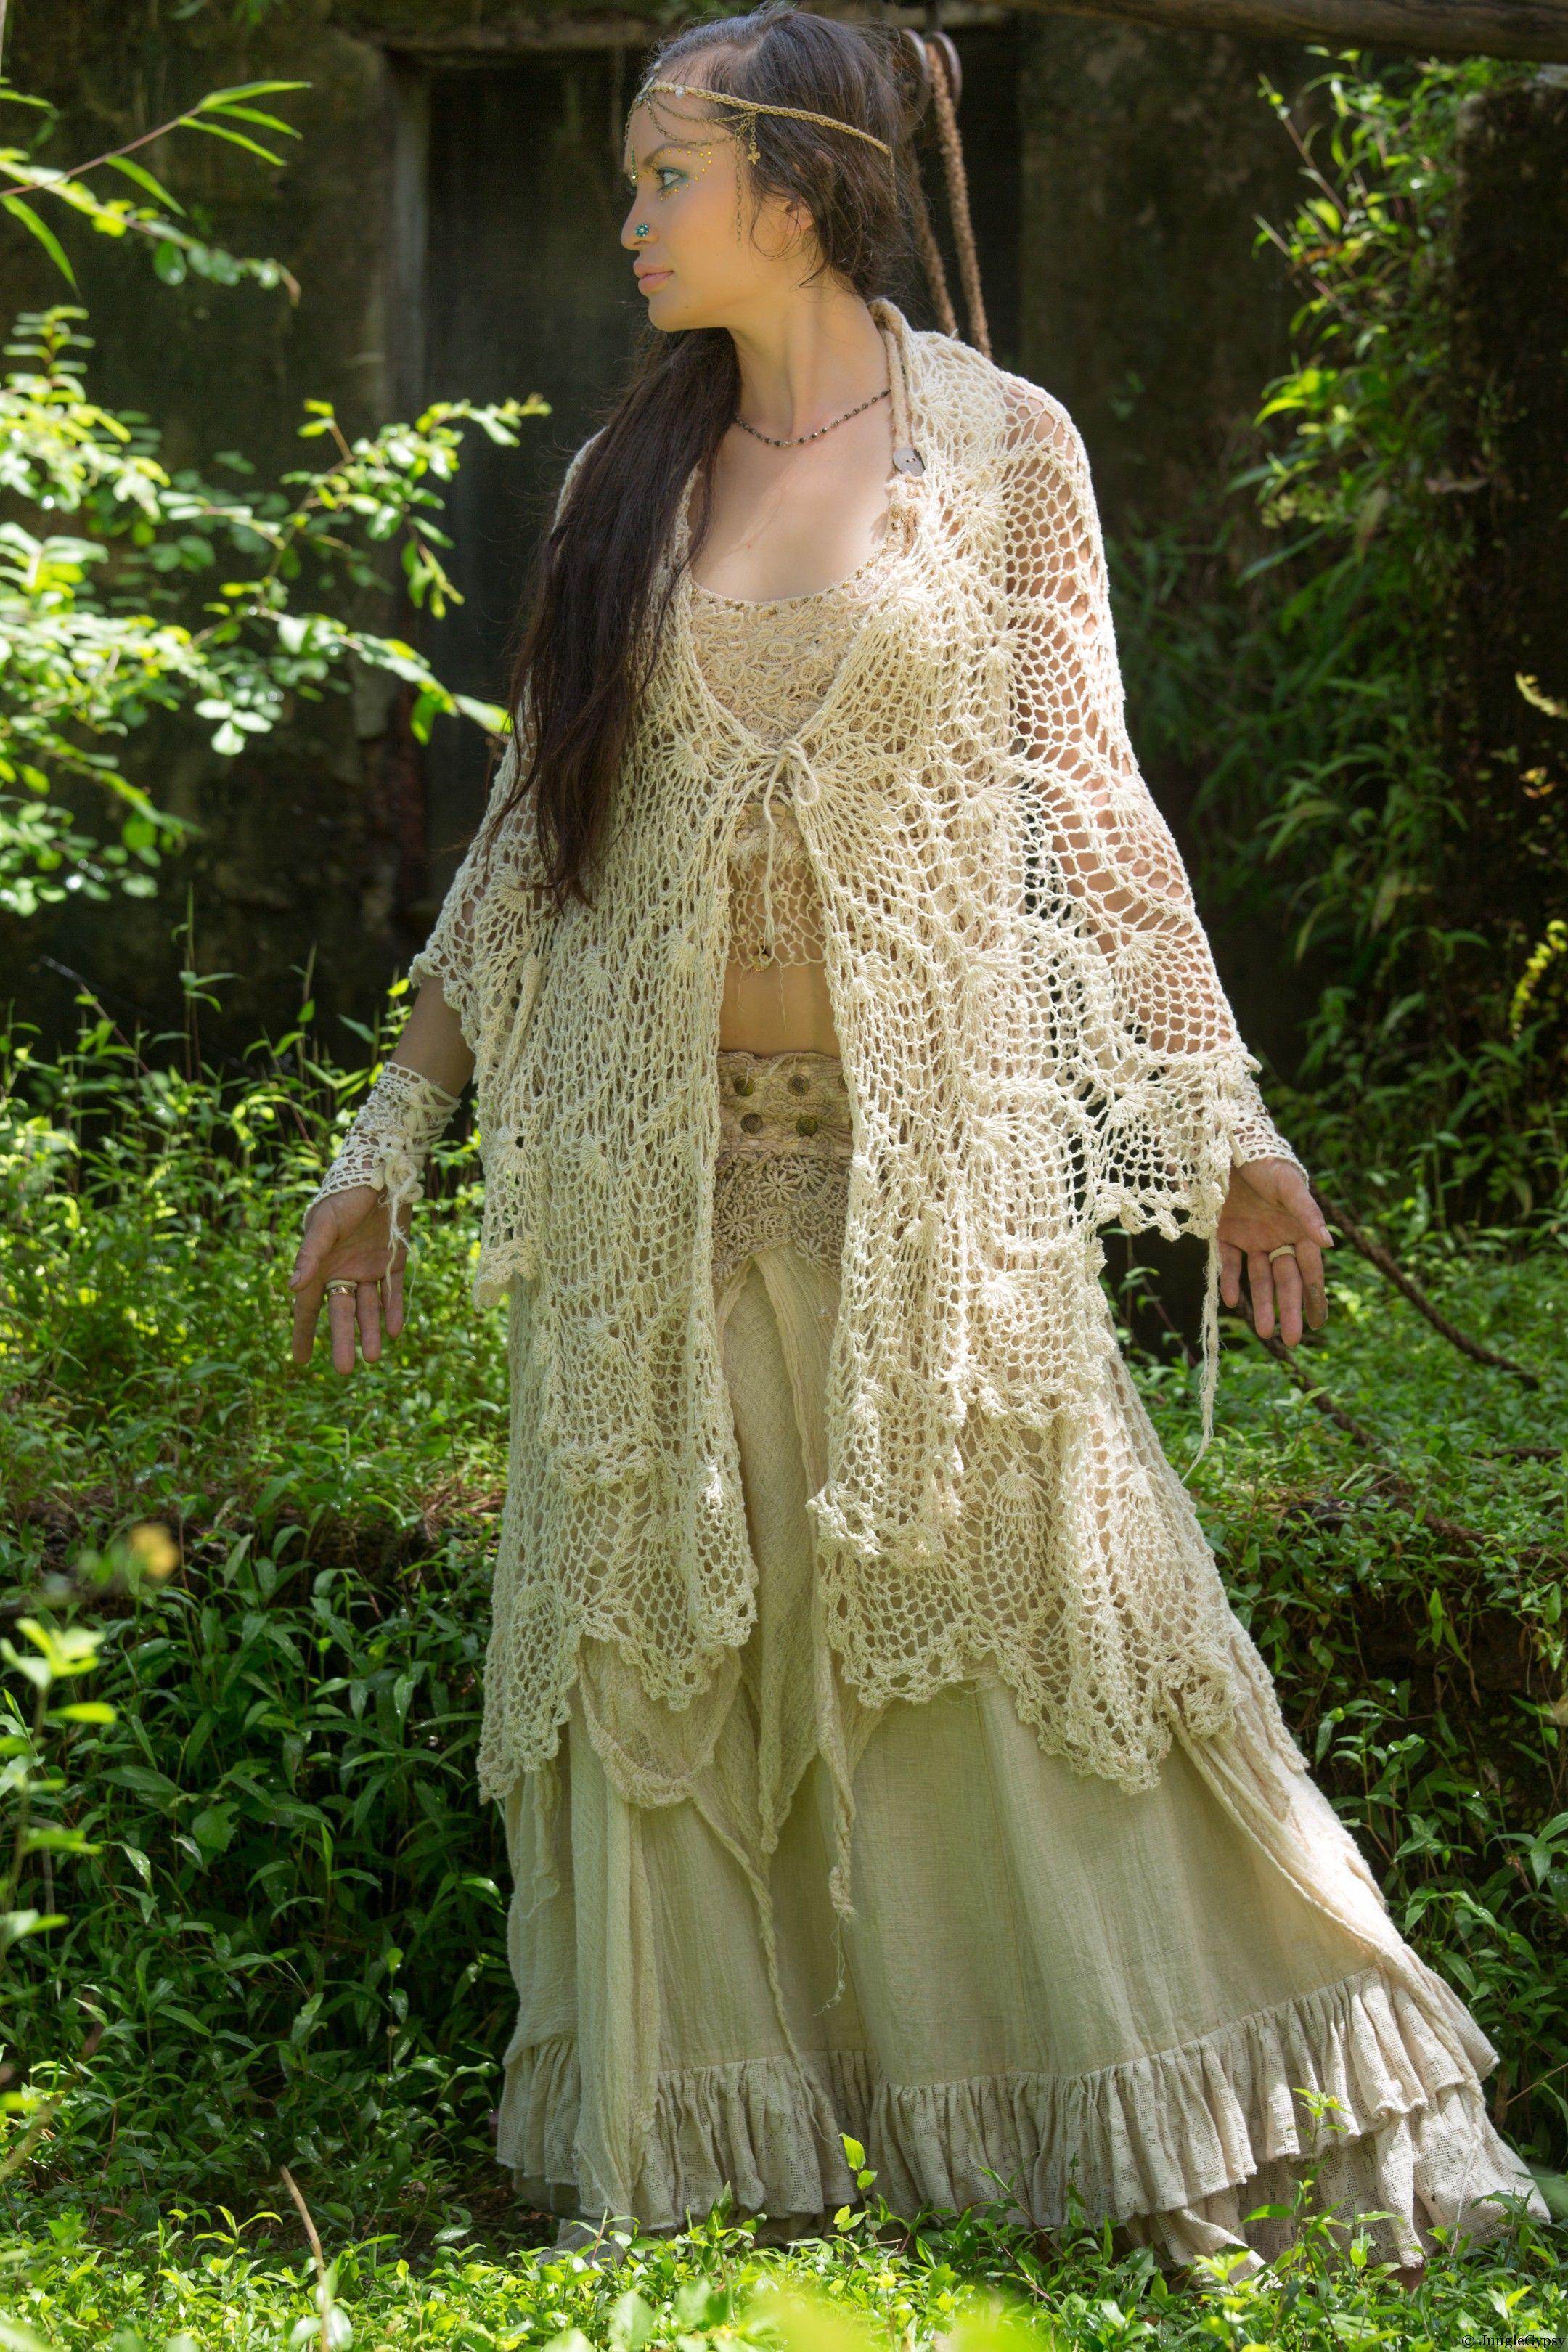 Unique Shawl Vest The Enchantress Jungle Gypsy Knit